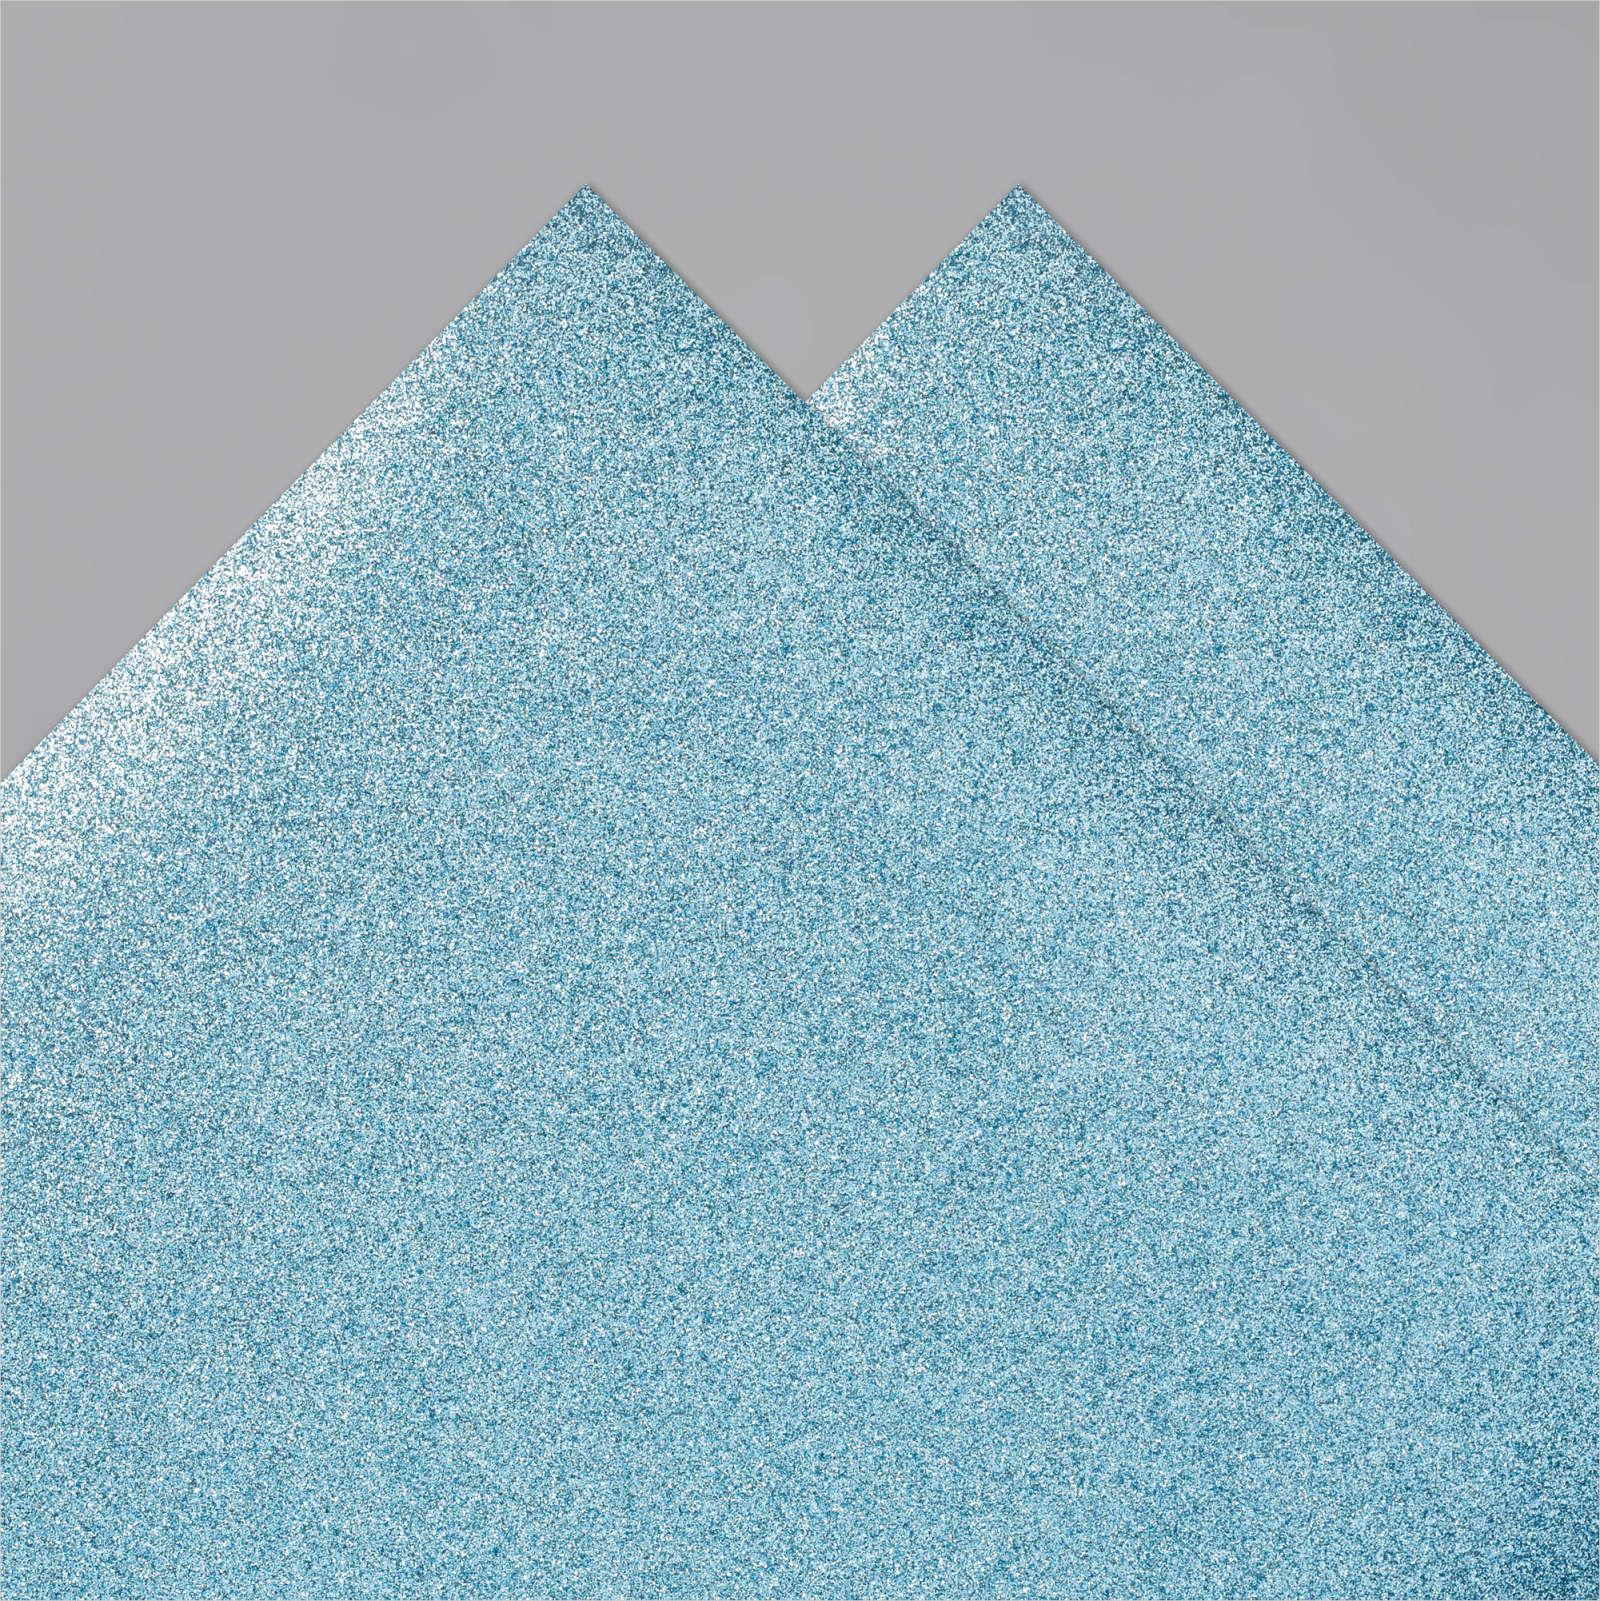 BALMY BLUE GLIMMER PAPER